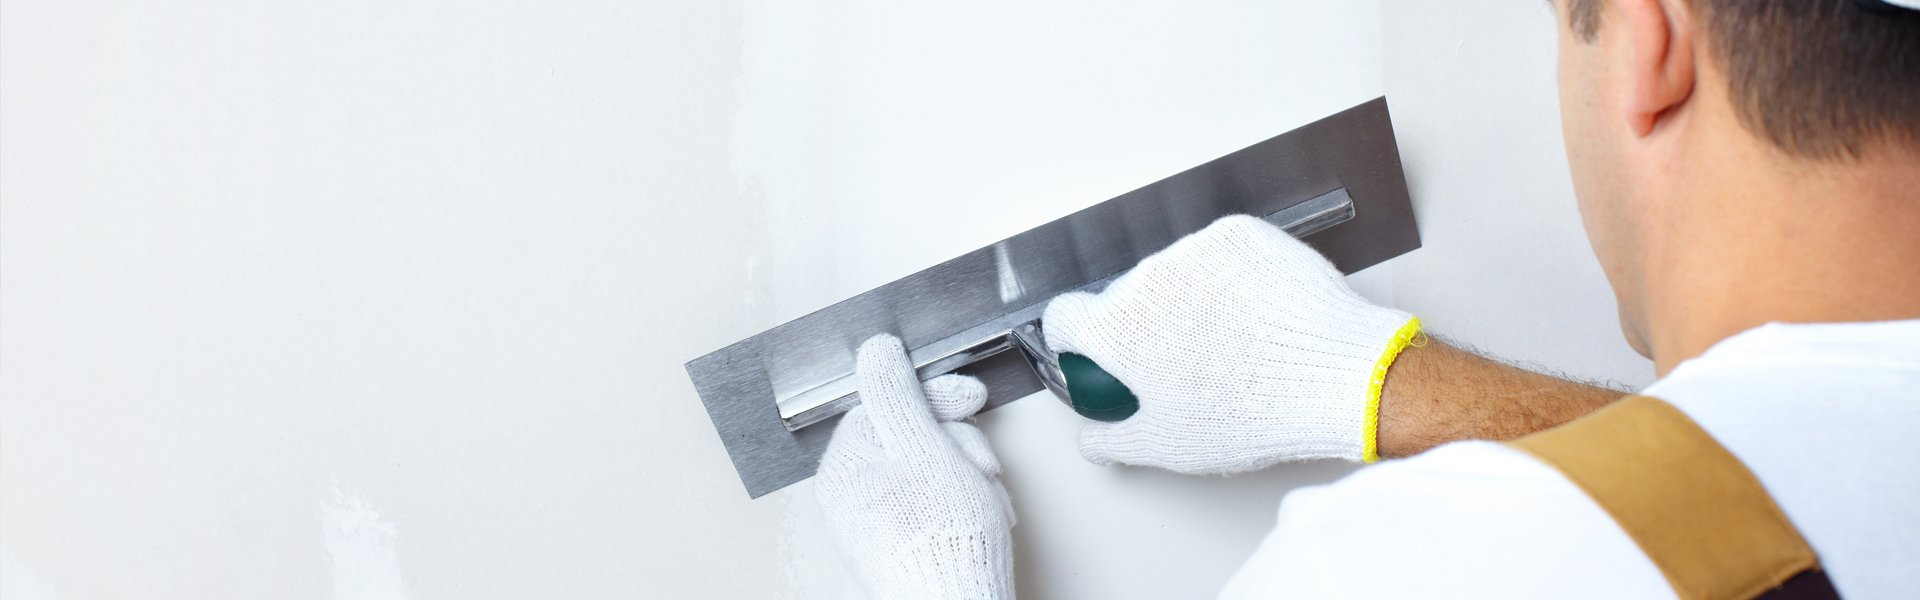 Screeding Bathroom Floor Plastering And Floor Screeding By Experts In Brighton Hove